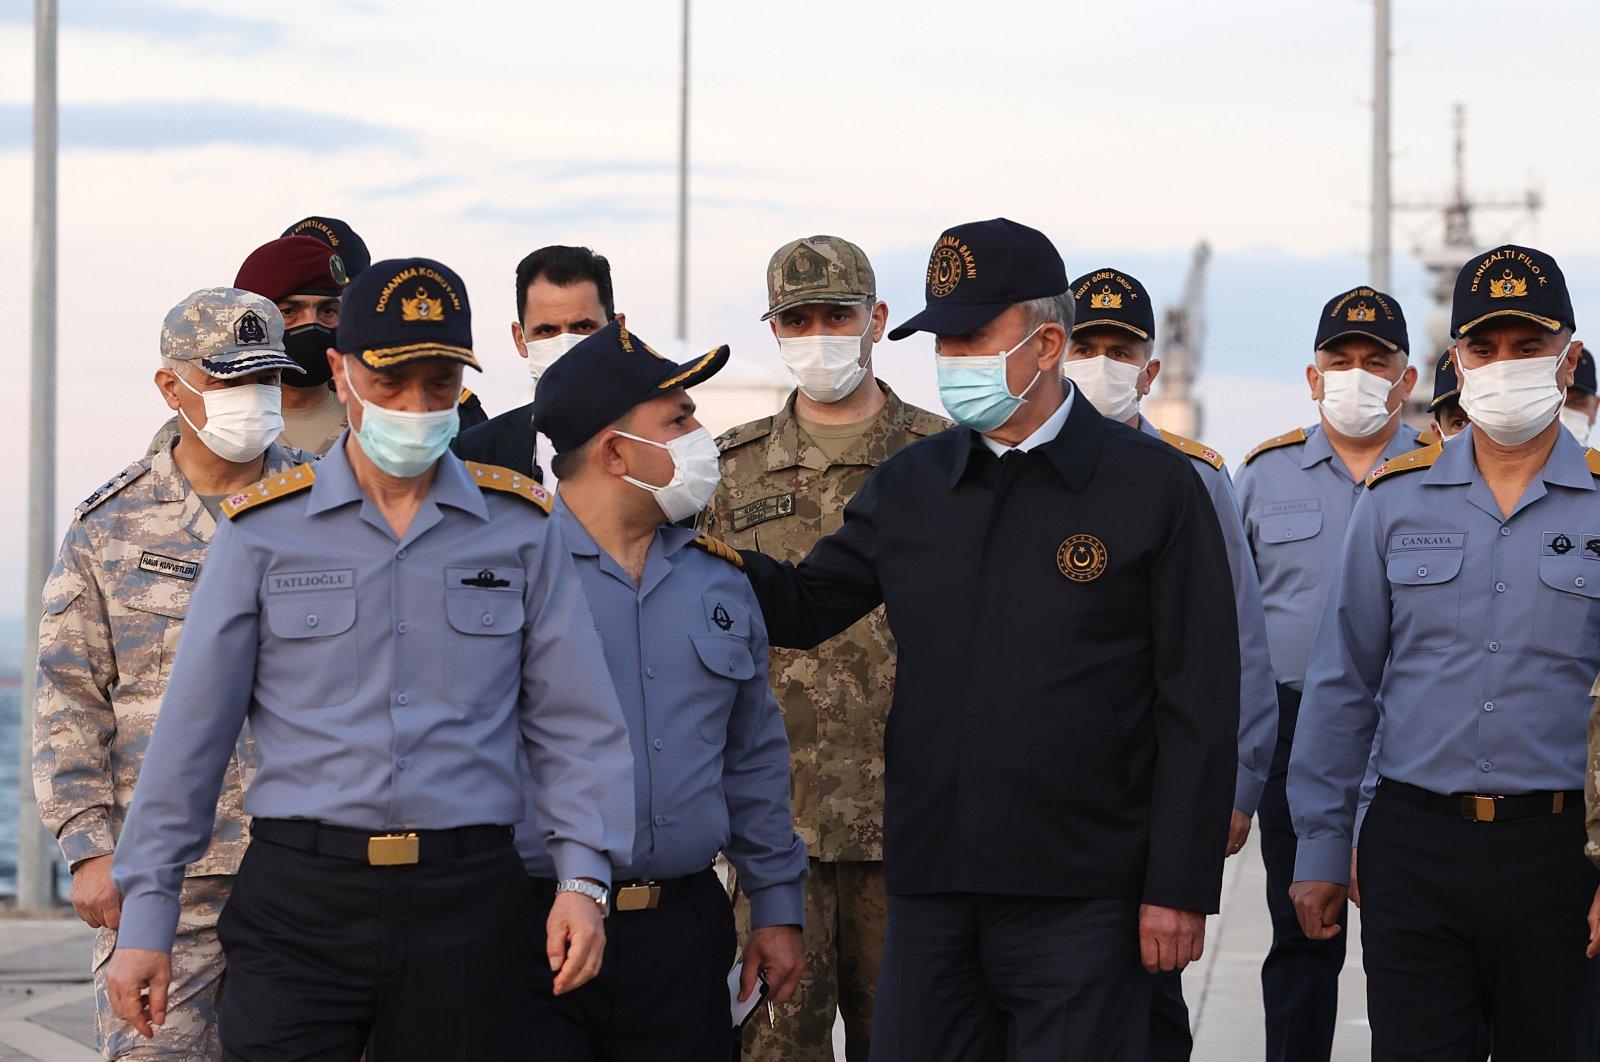 Defense Minister Hulusi Akar (in black) visits Gölcük Fleet Command in Kocaeli province, Turkey, May 5, 2021. (AA Photo)